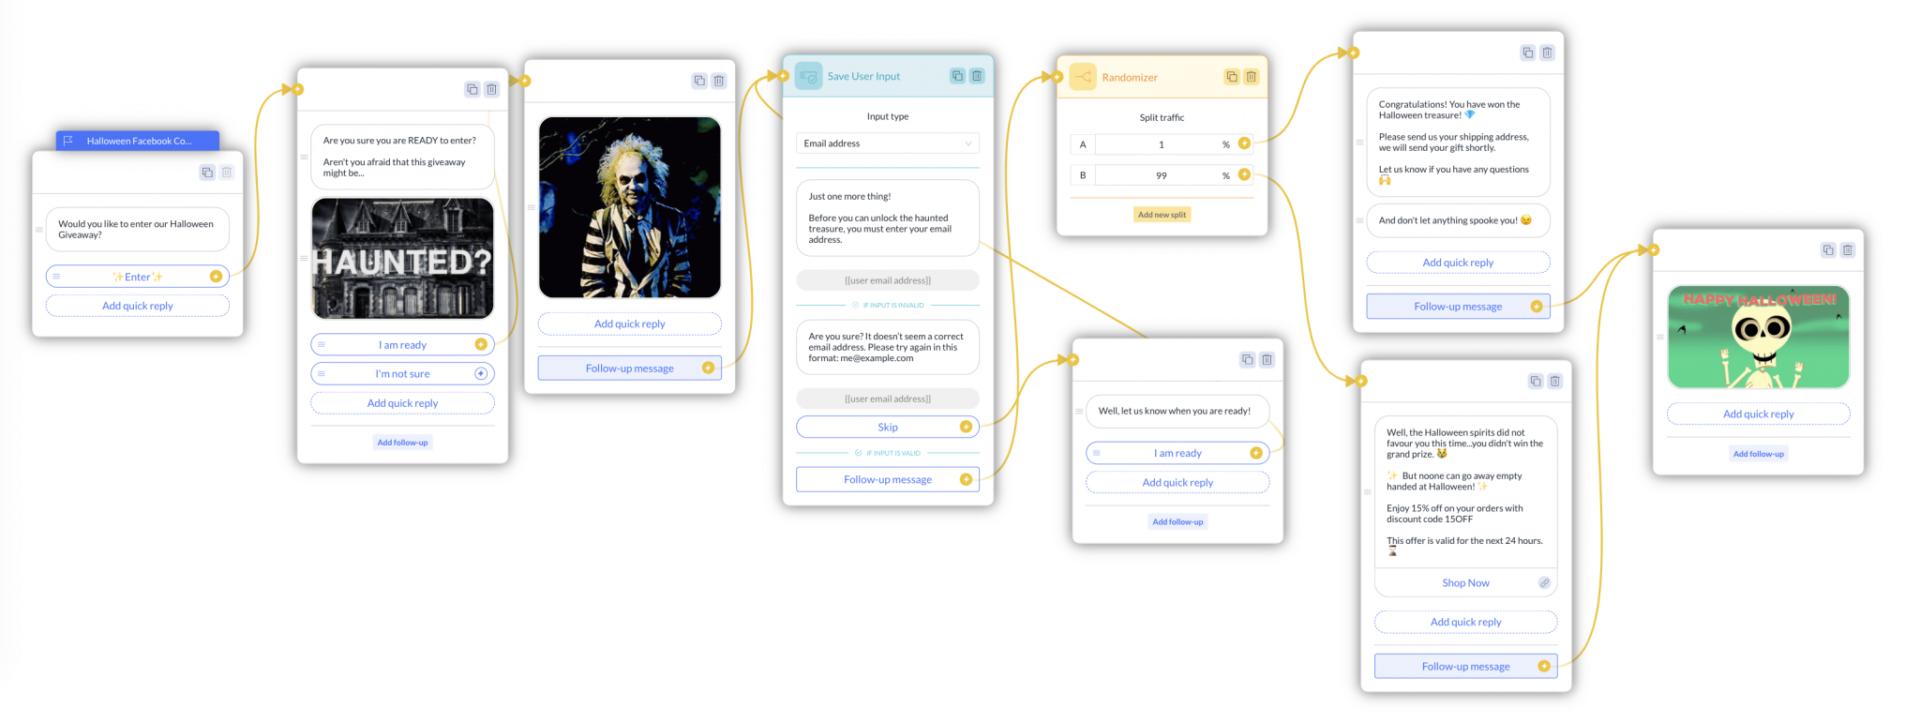 interactive Facebook messenger marketing campaign 3